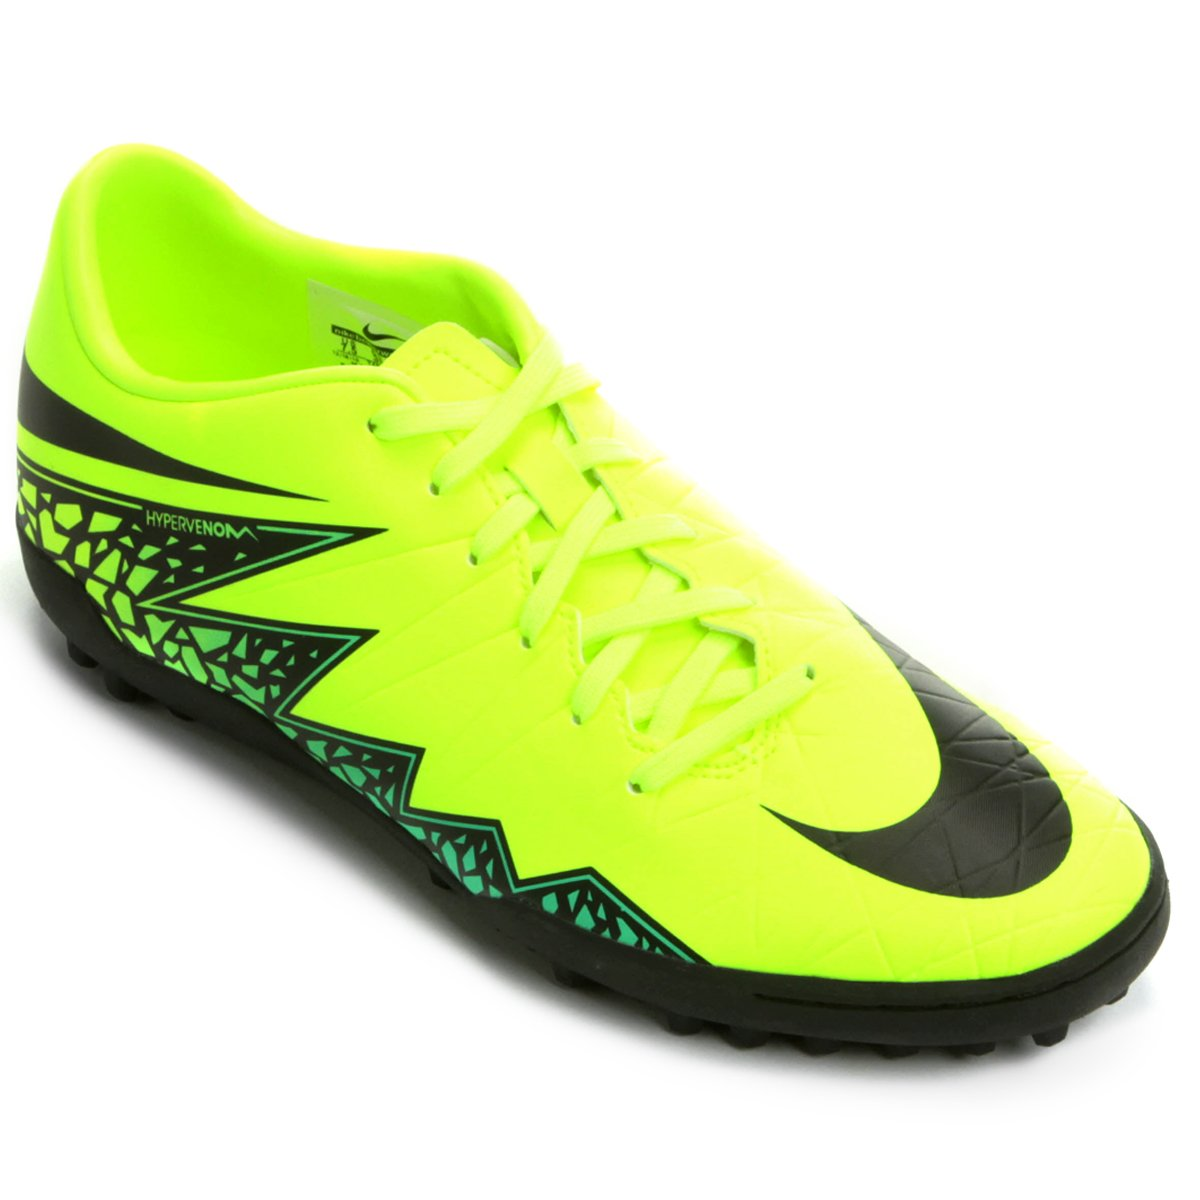 Chuteira Society Nike Hypervenom Phelon 2 TF - Compre Agora  7ade07c86b383